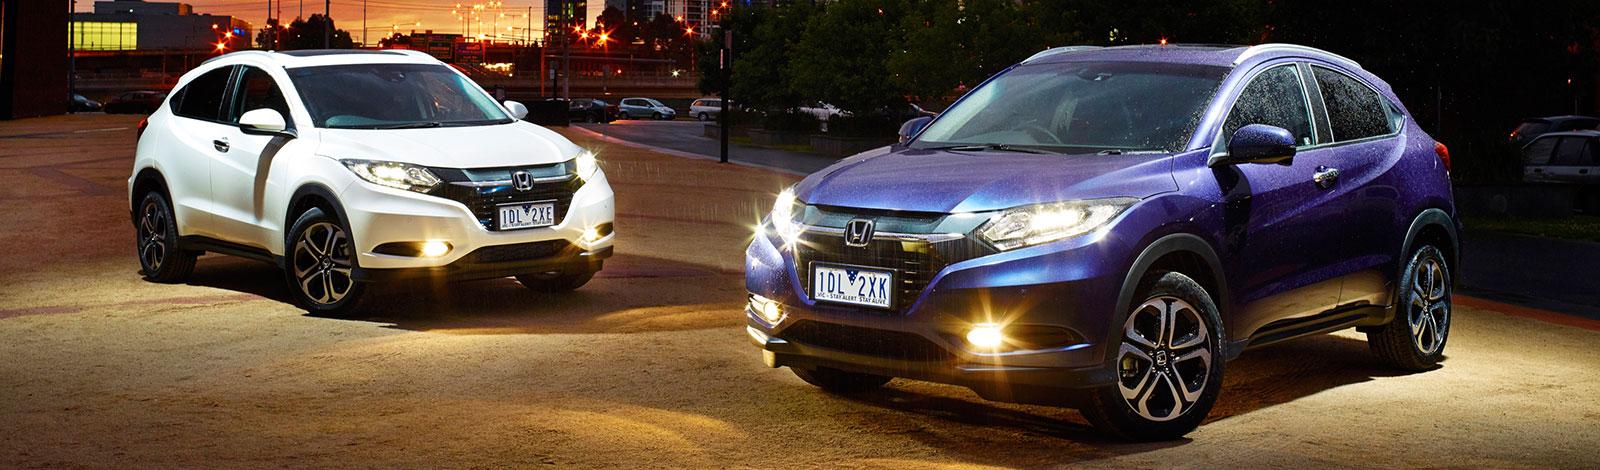 Exclusive: Honda customer service shock